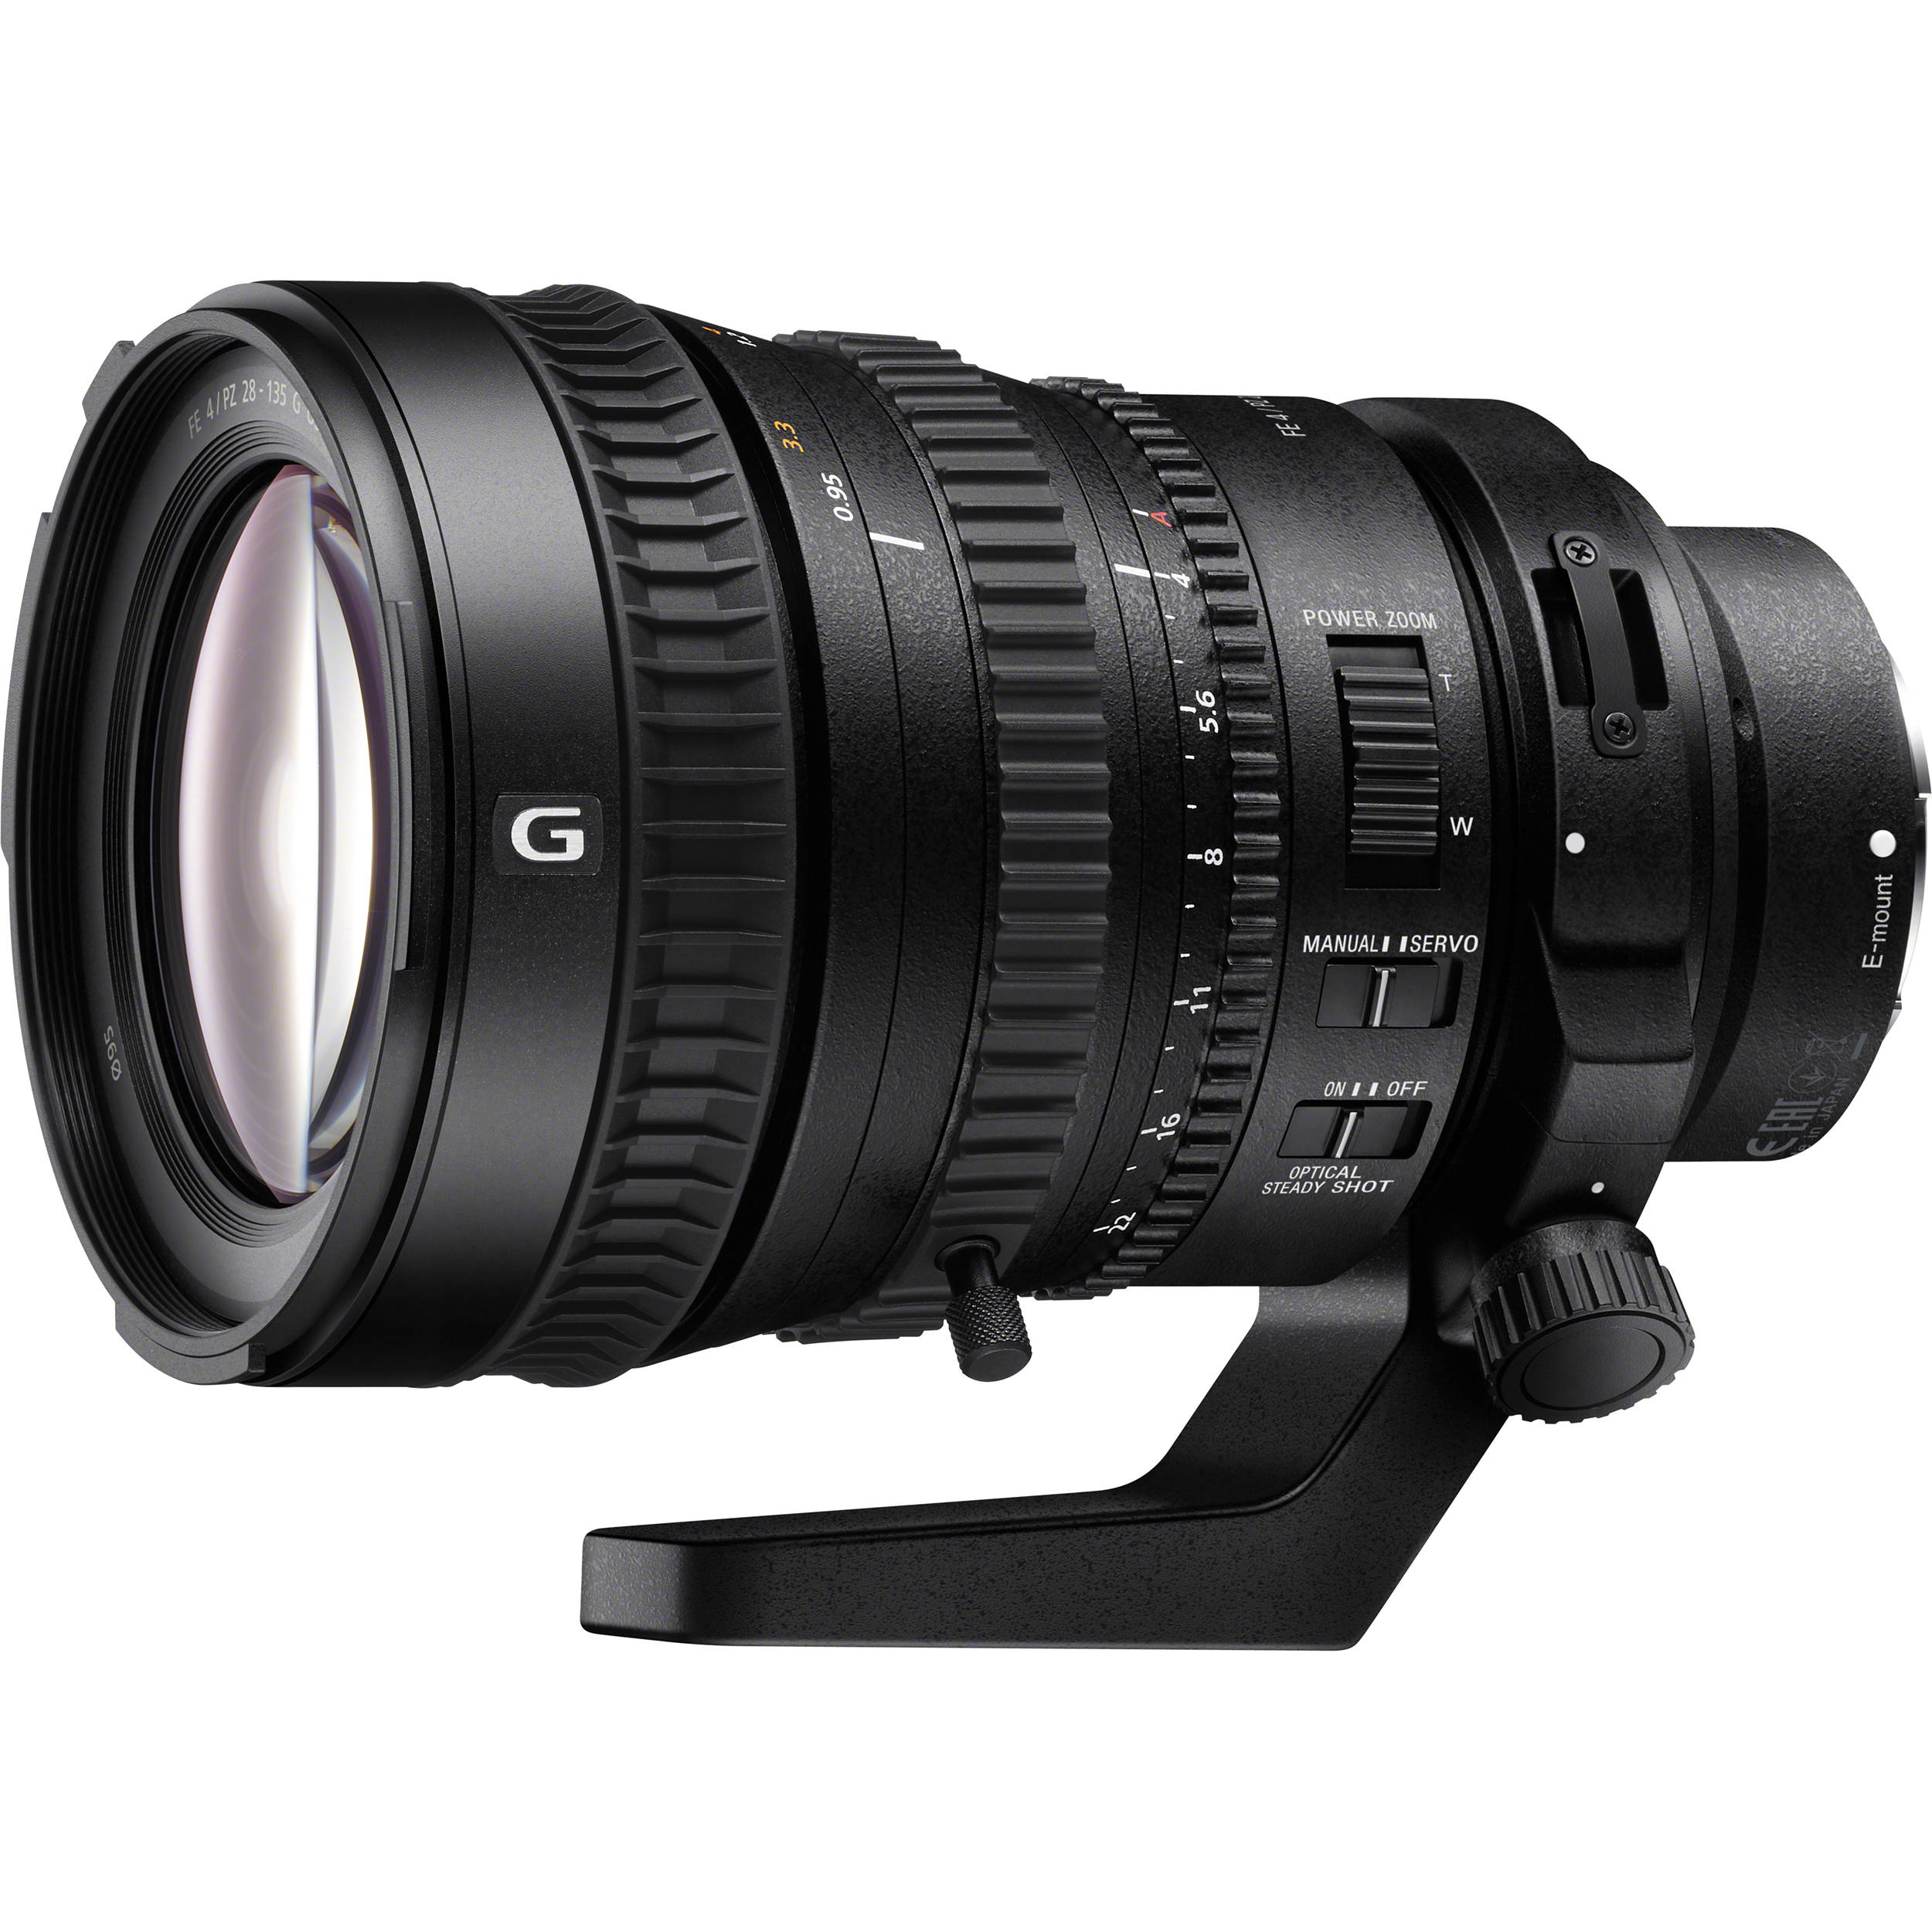 Sony Fe Pz 28 135mm F 4 G Oss Lens Selp28135g Bh Photo Video Free Pcb Design Software Freepcb V1355